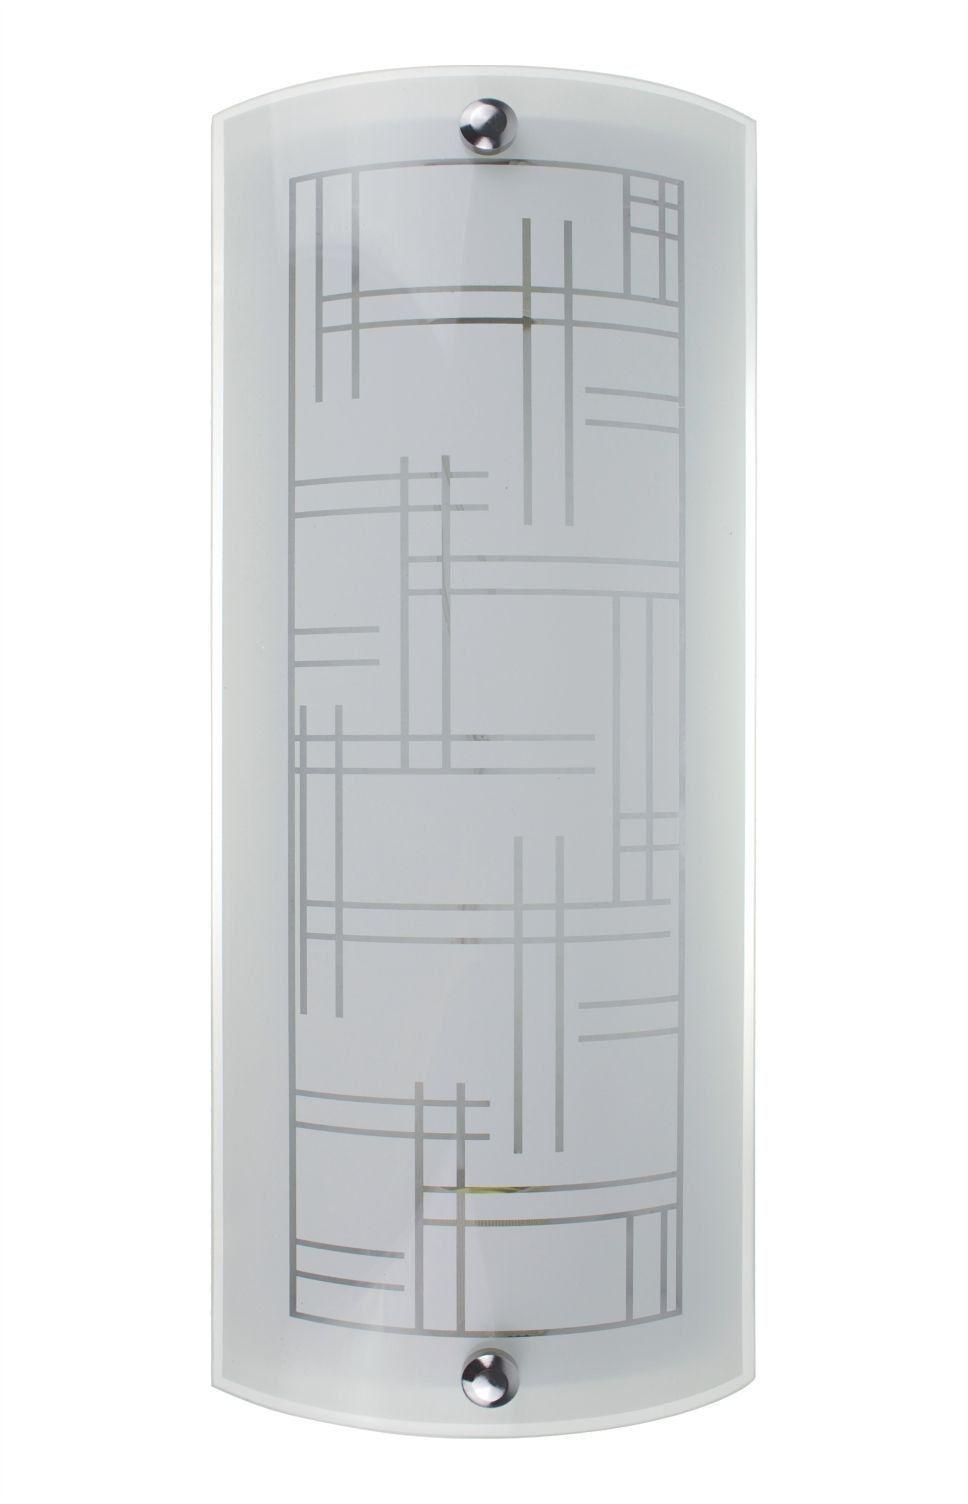 Arandela Rio Branco Fosco Cristal Ar3012/2 Nacional